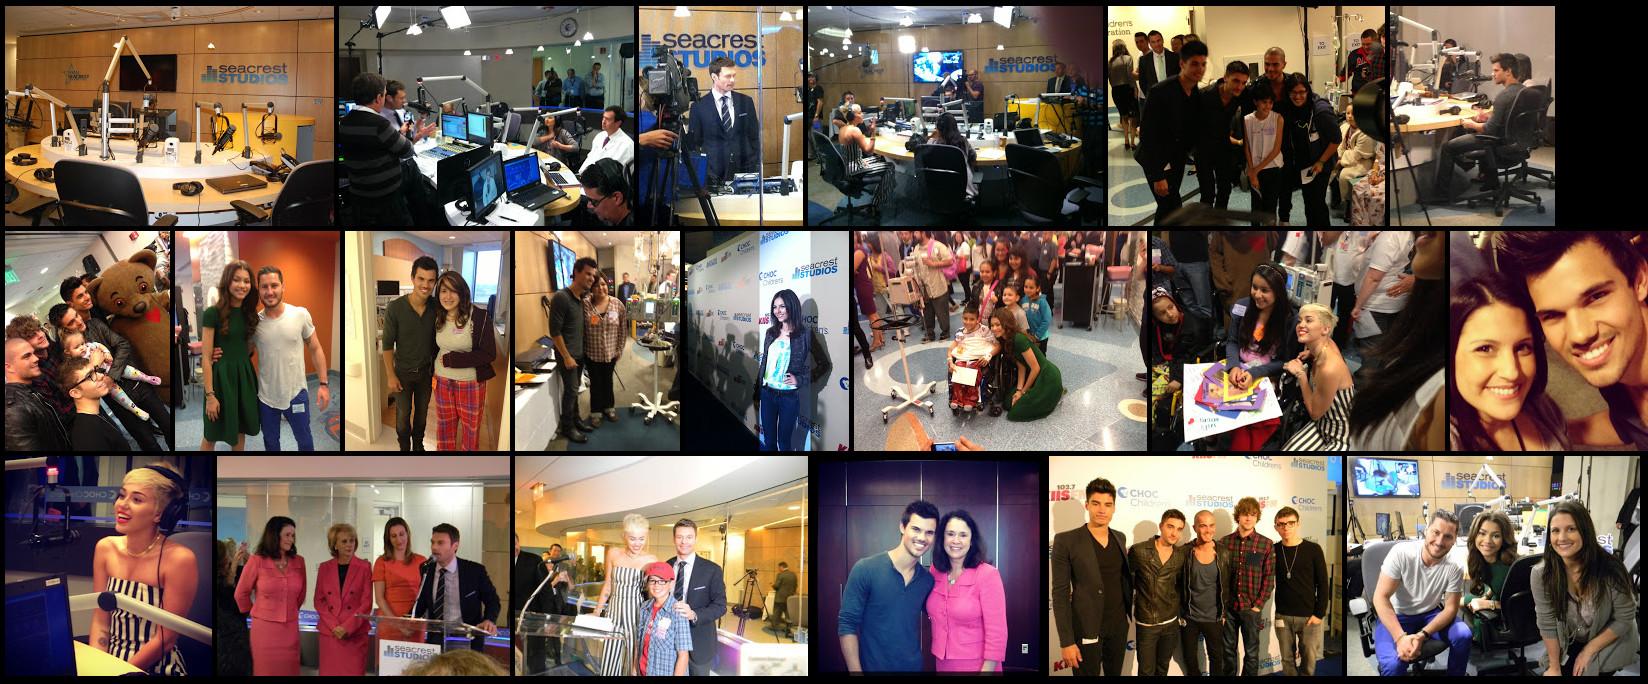 Special guests visit the Seacrest Studio